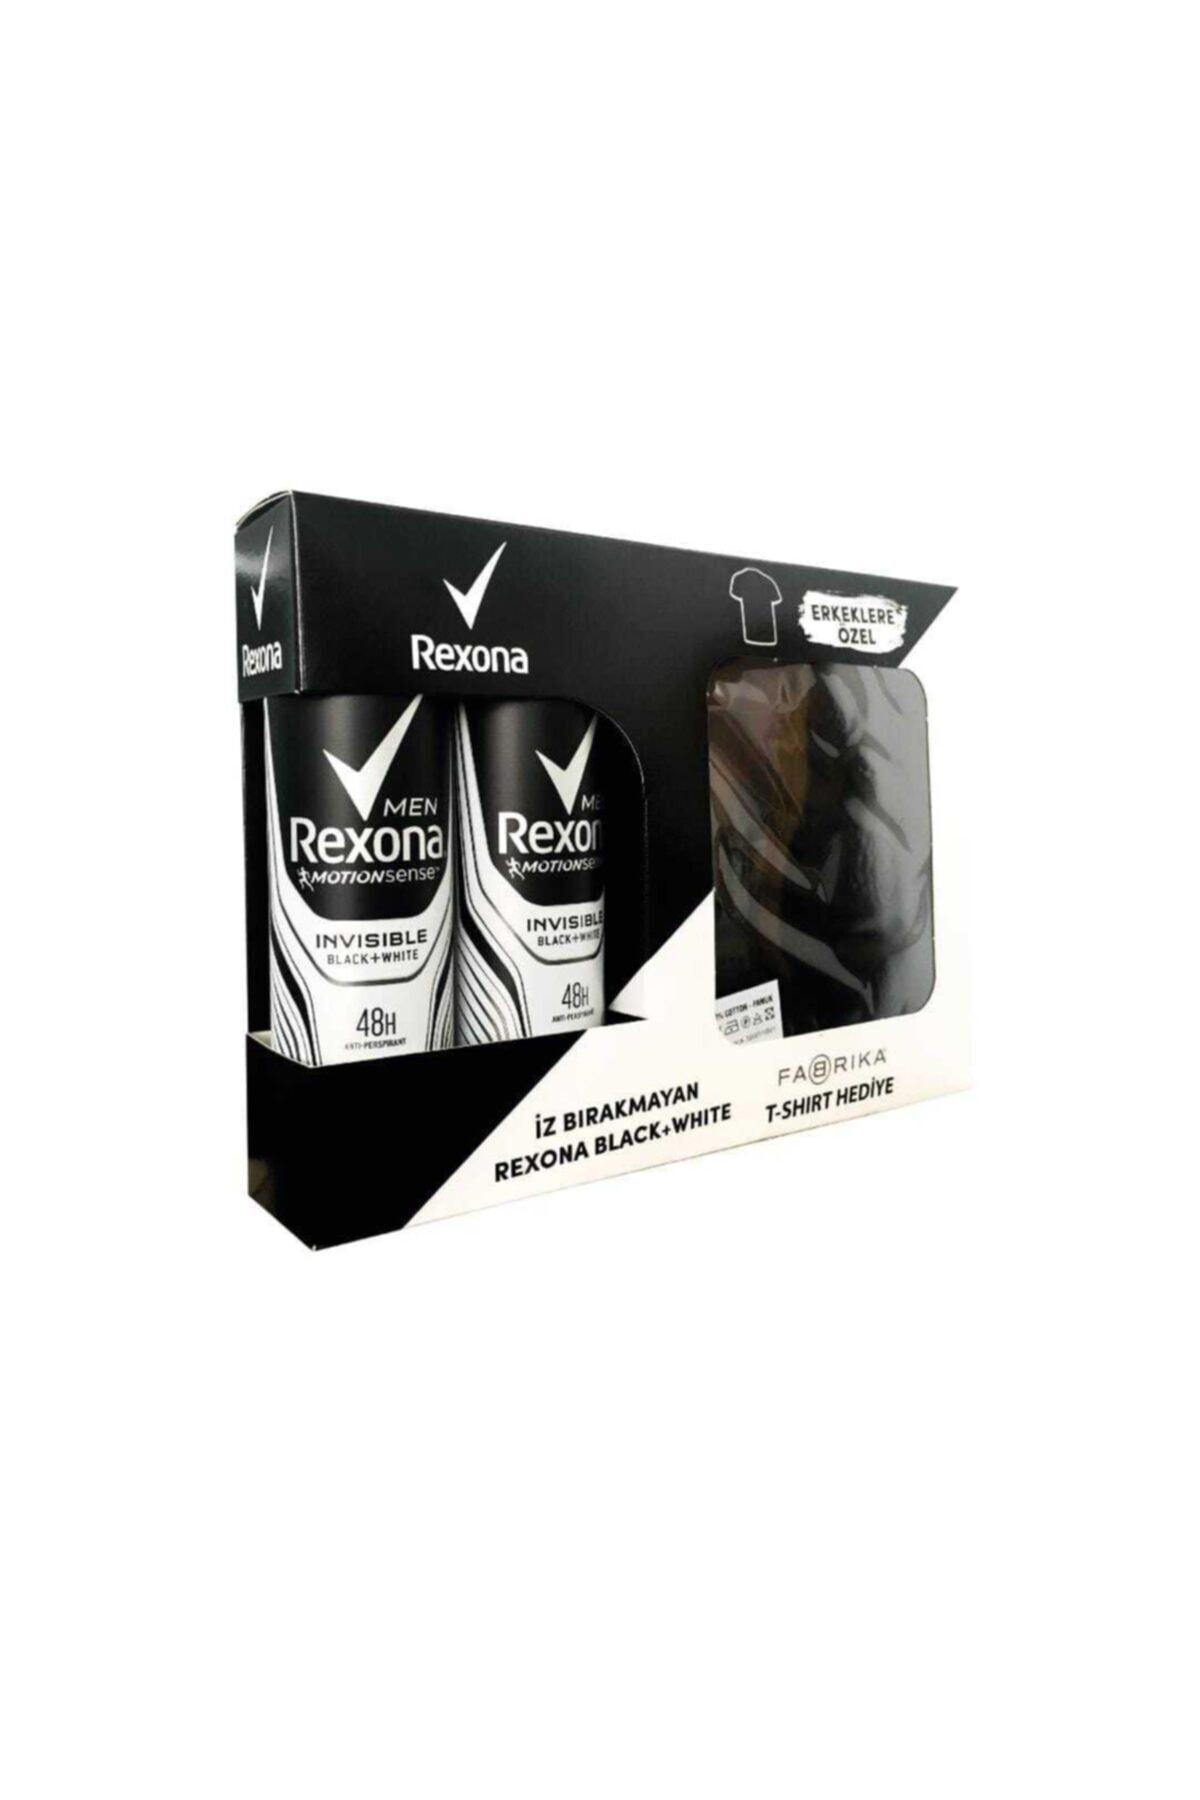 Rexona Men Invisible Black + White Anti-perspirant Deodorant 2 X 150 Ml Adet Fabrika T-shirt Hediyel 1